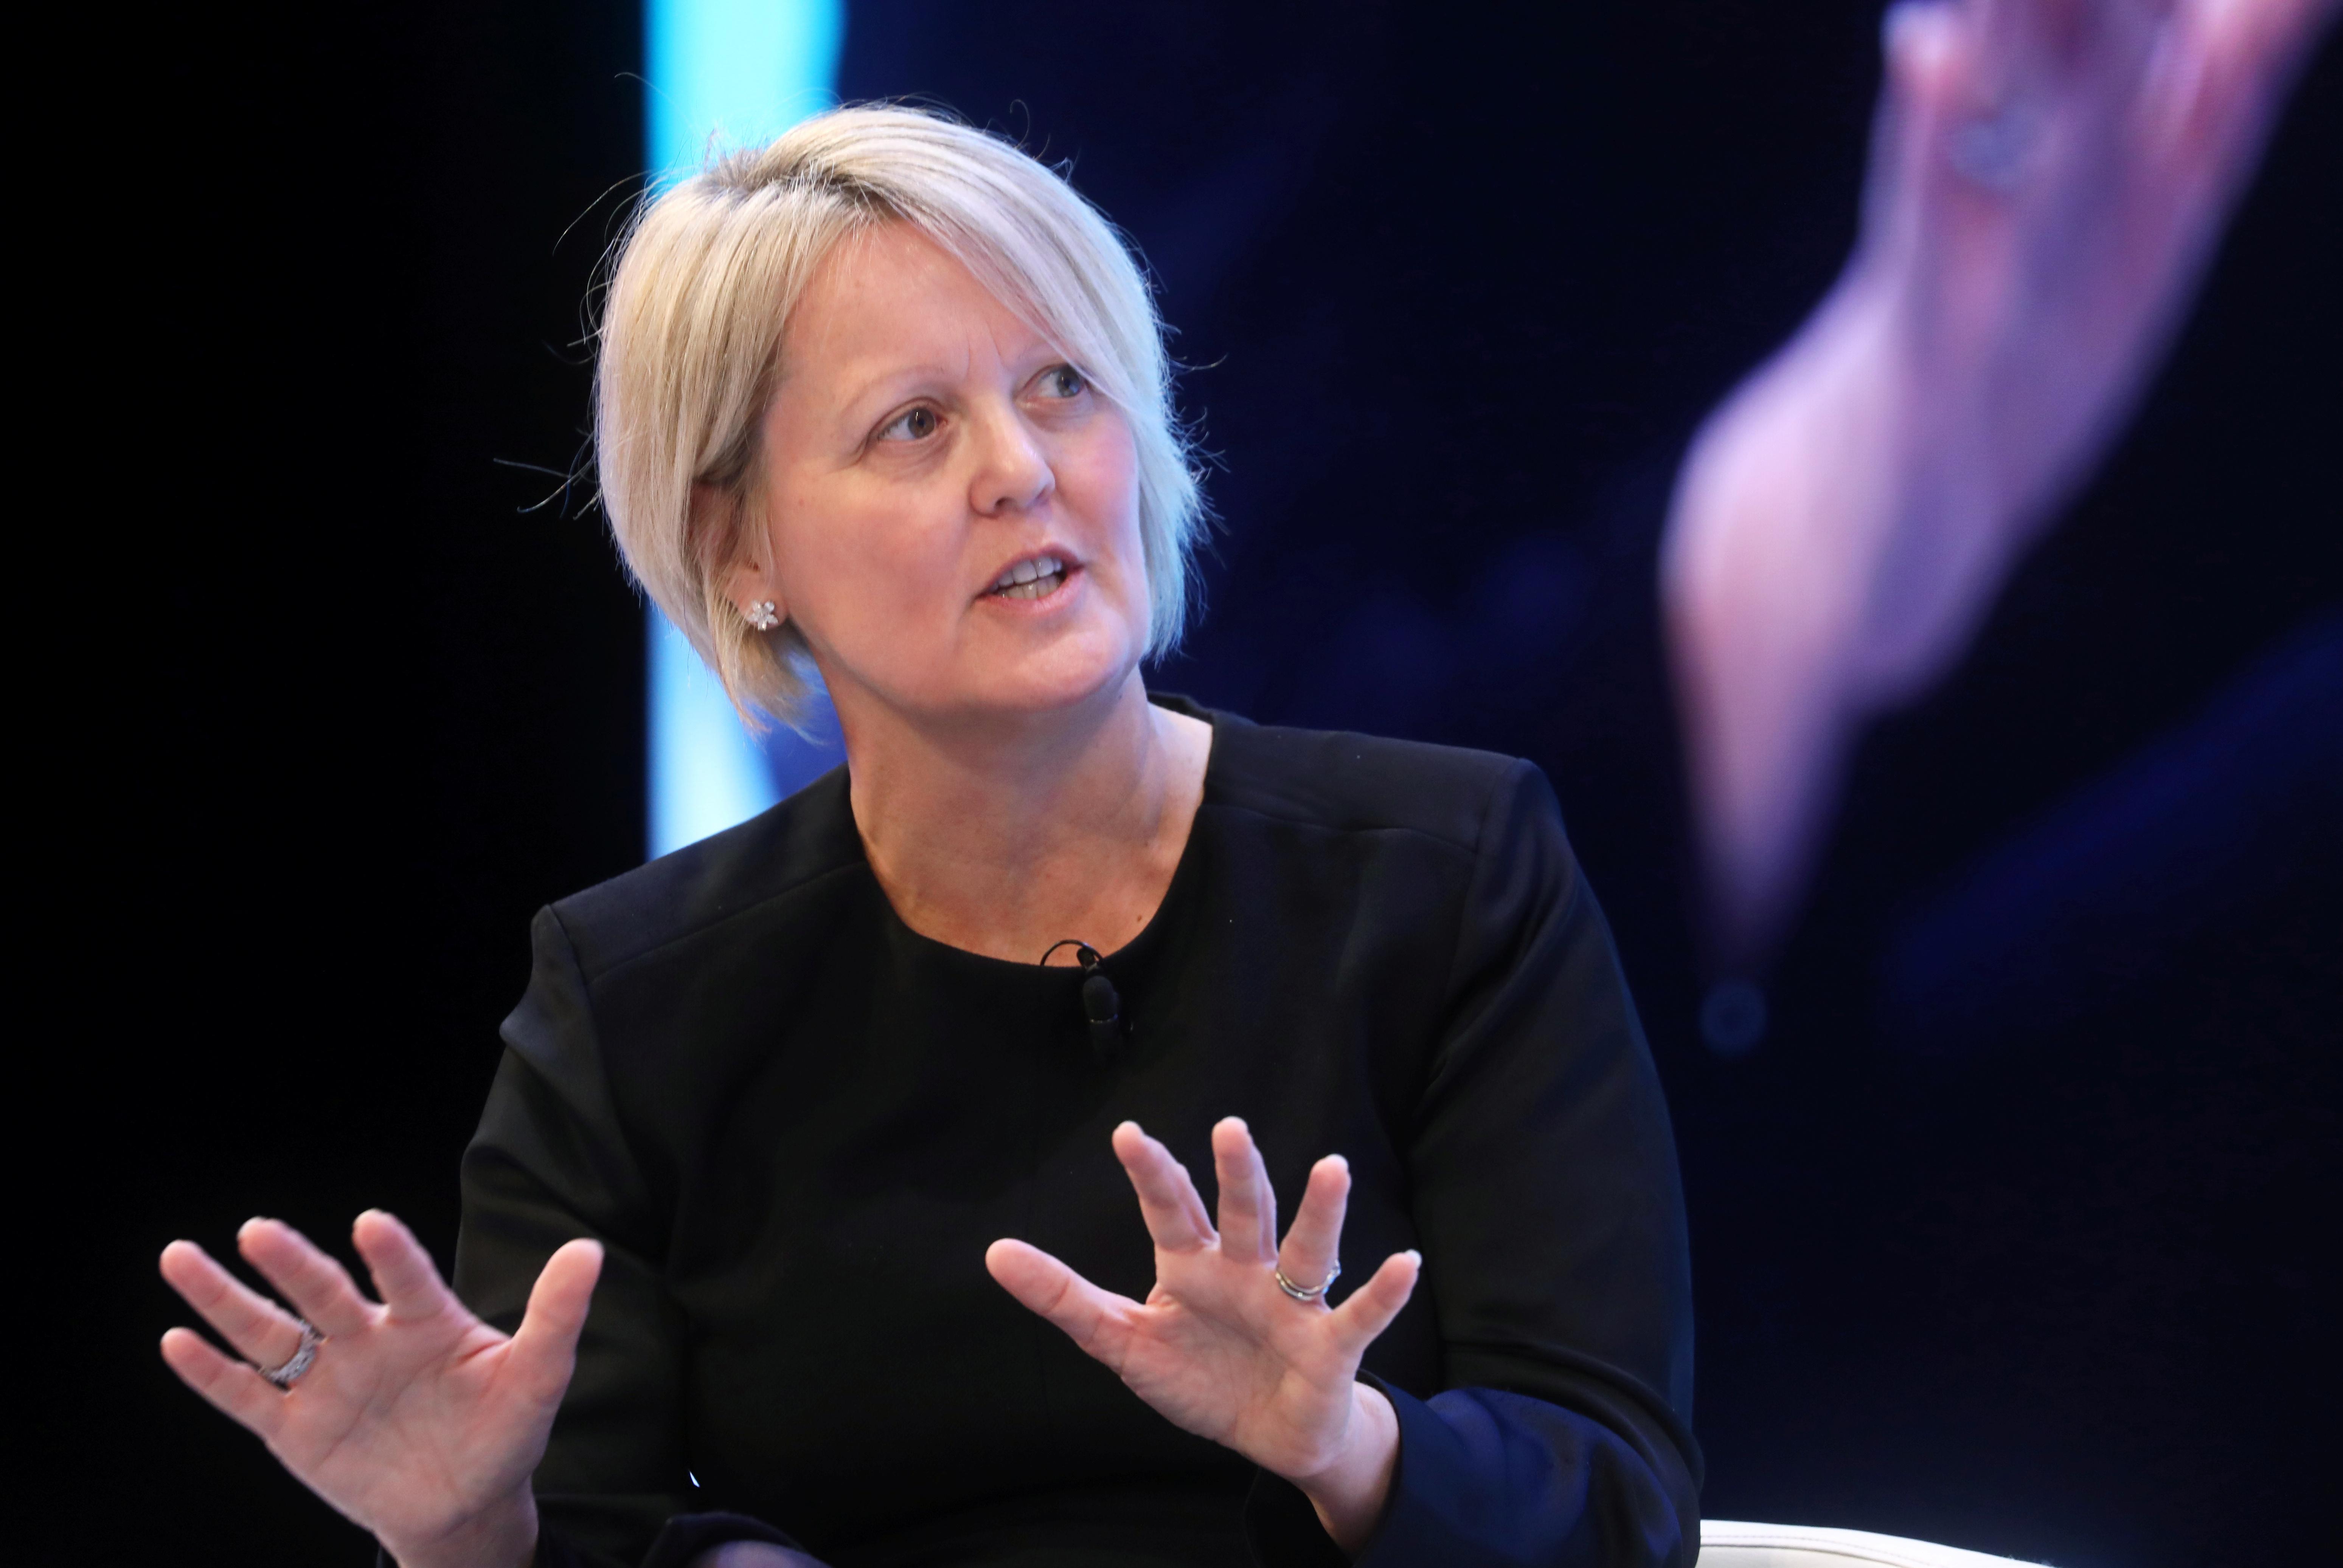 RBS CEO Alison Rose attends the annual CBI Conference in London, Britain November 18, 2019.